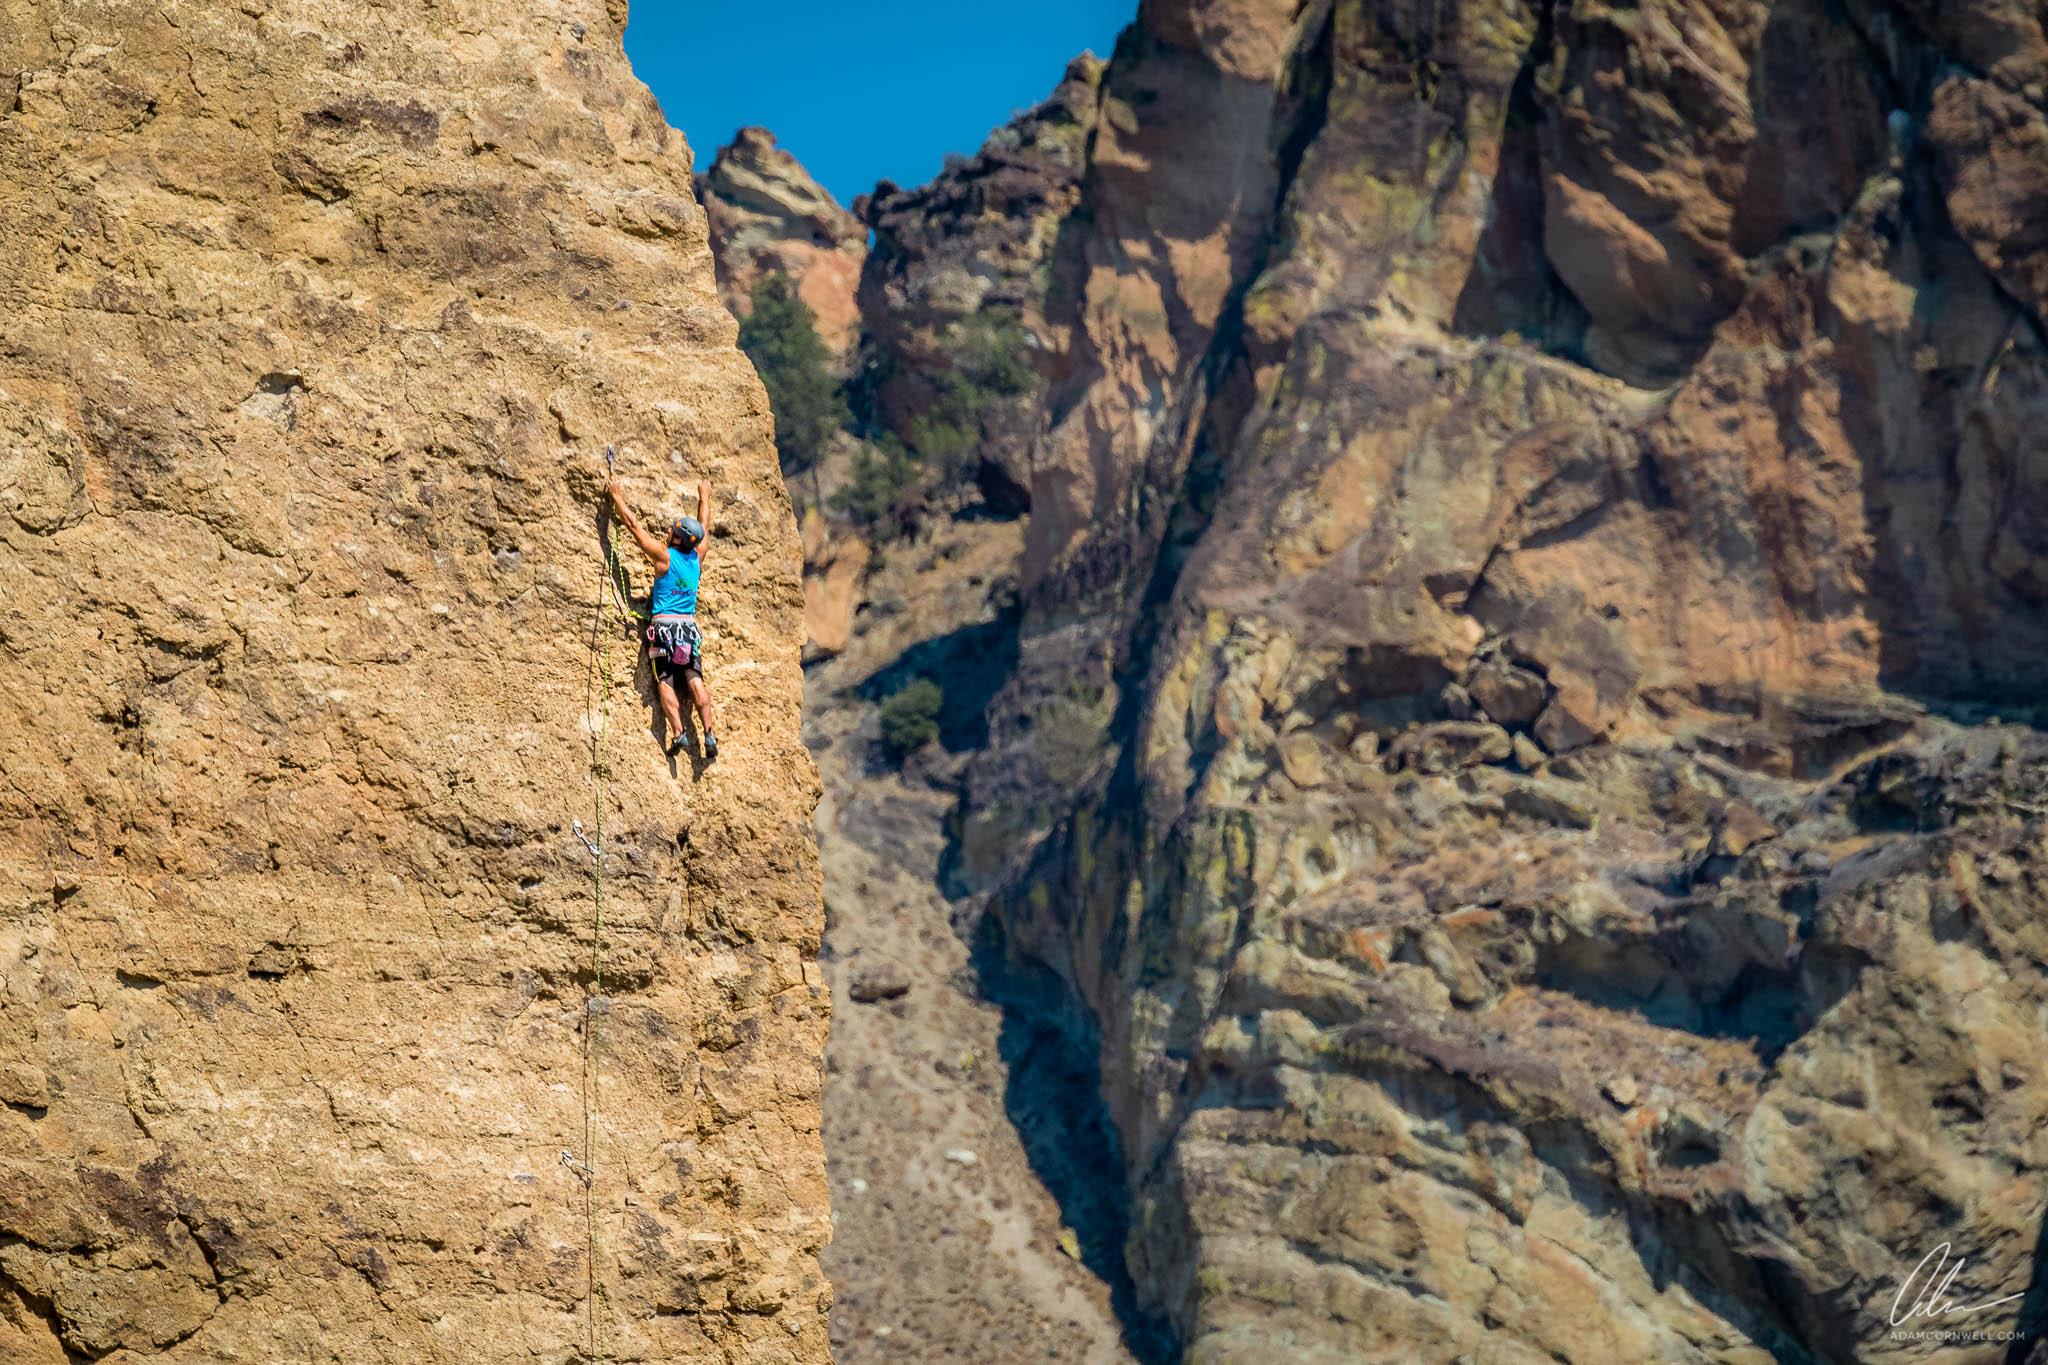 Climbing at Smith Rock